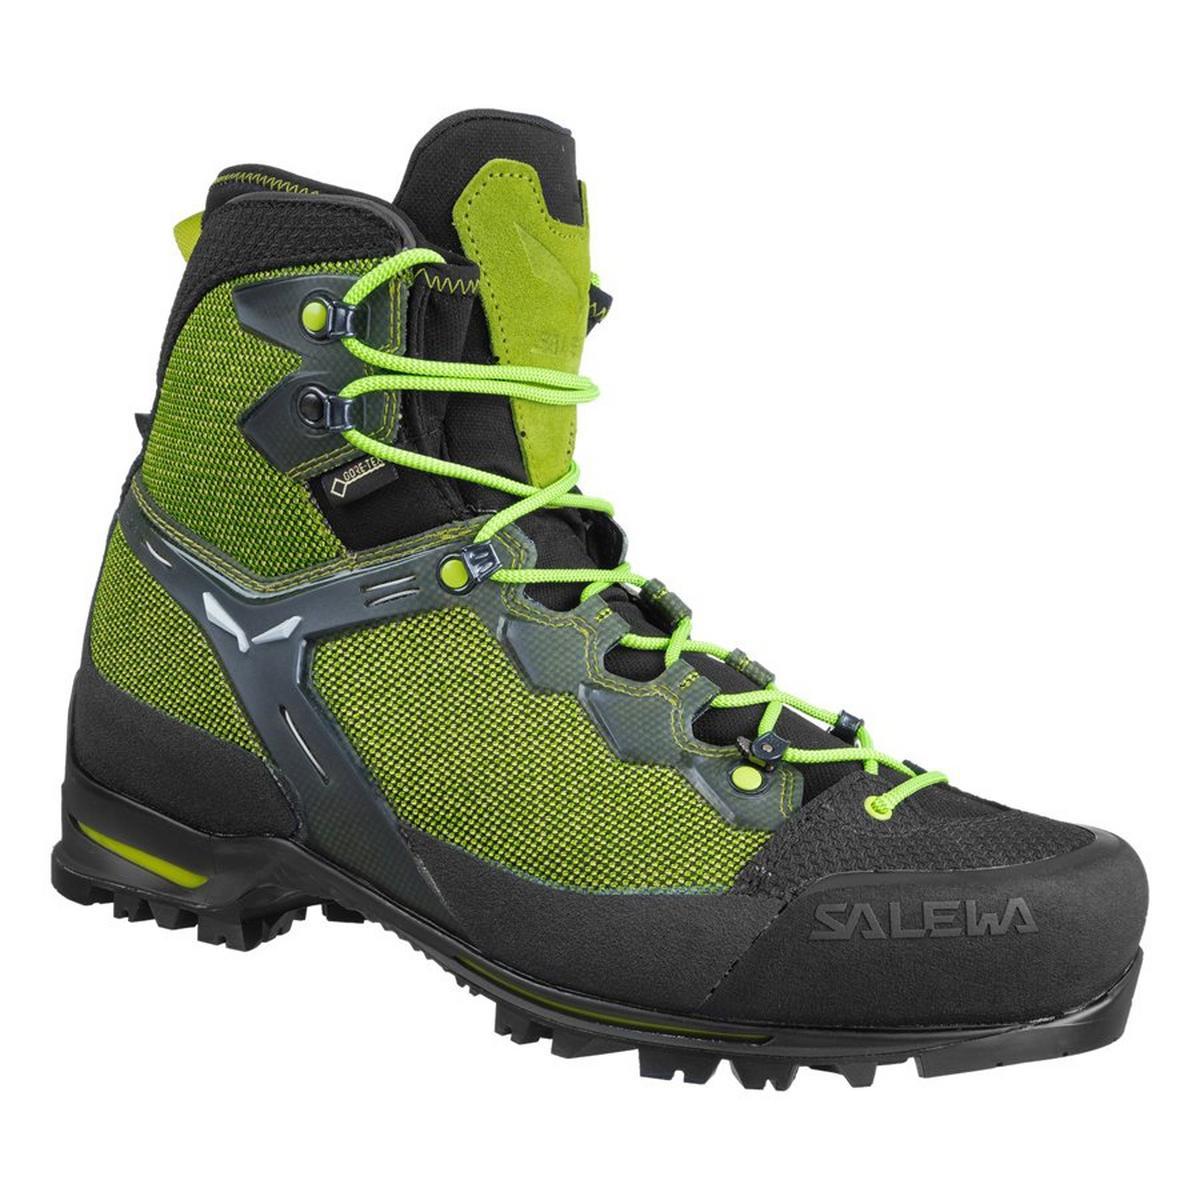 Salewa Men's Raven 3 GORE-TEX Mountaineering Boot